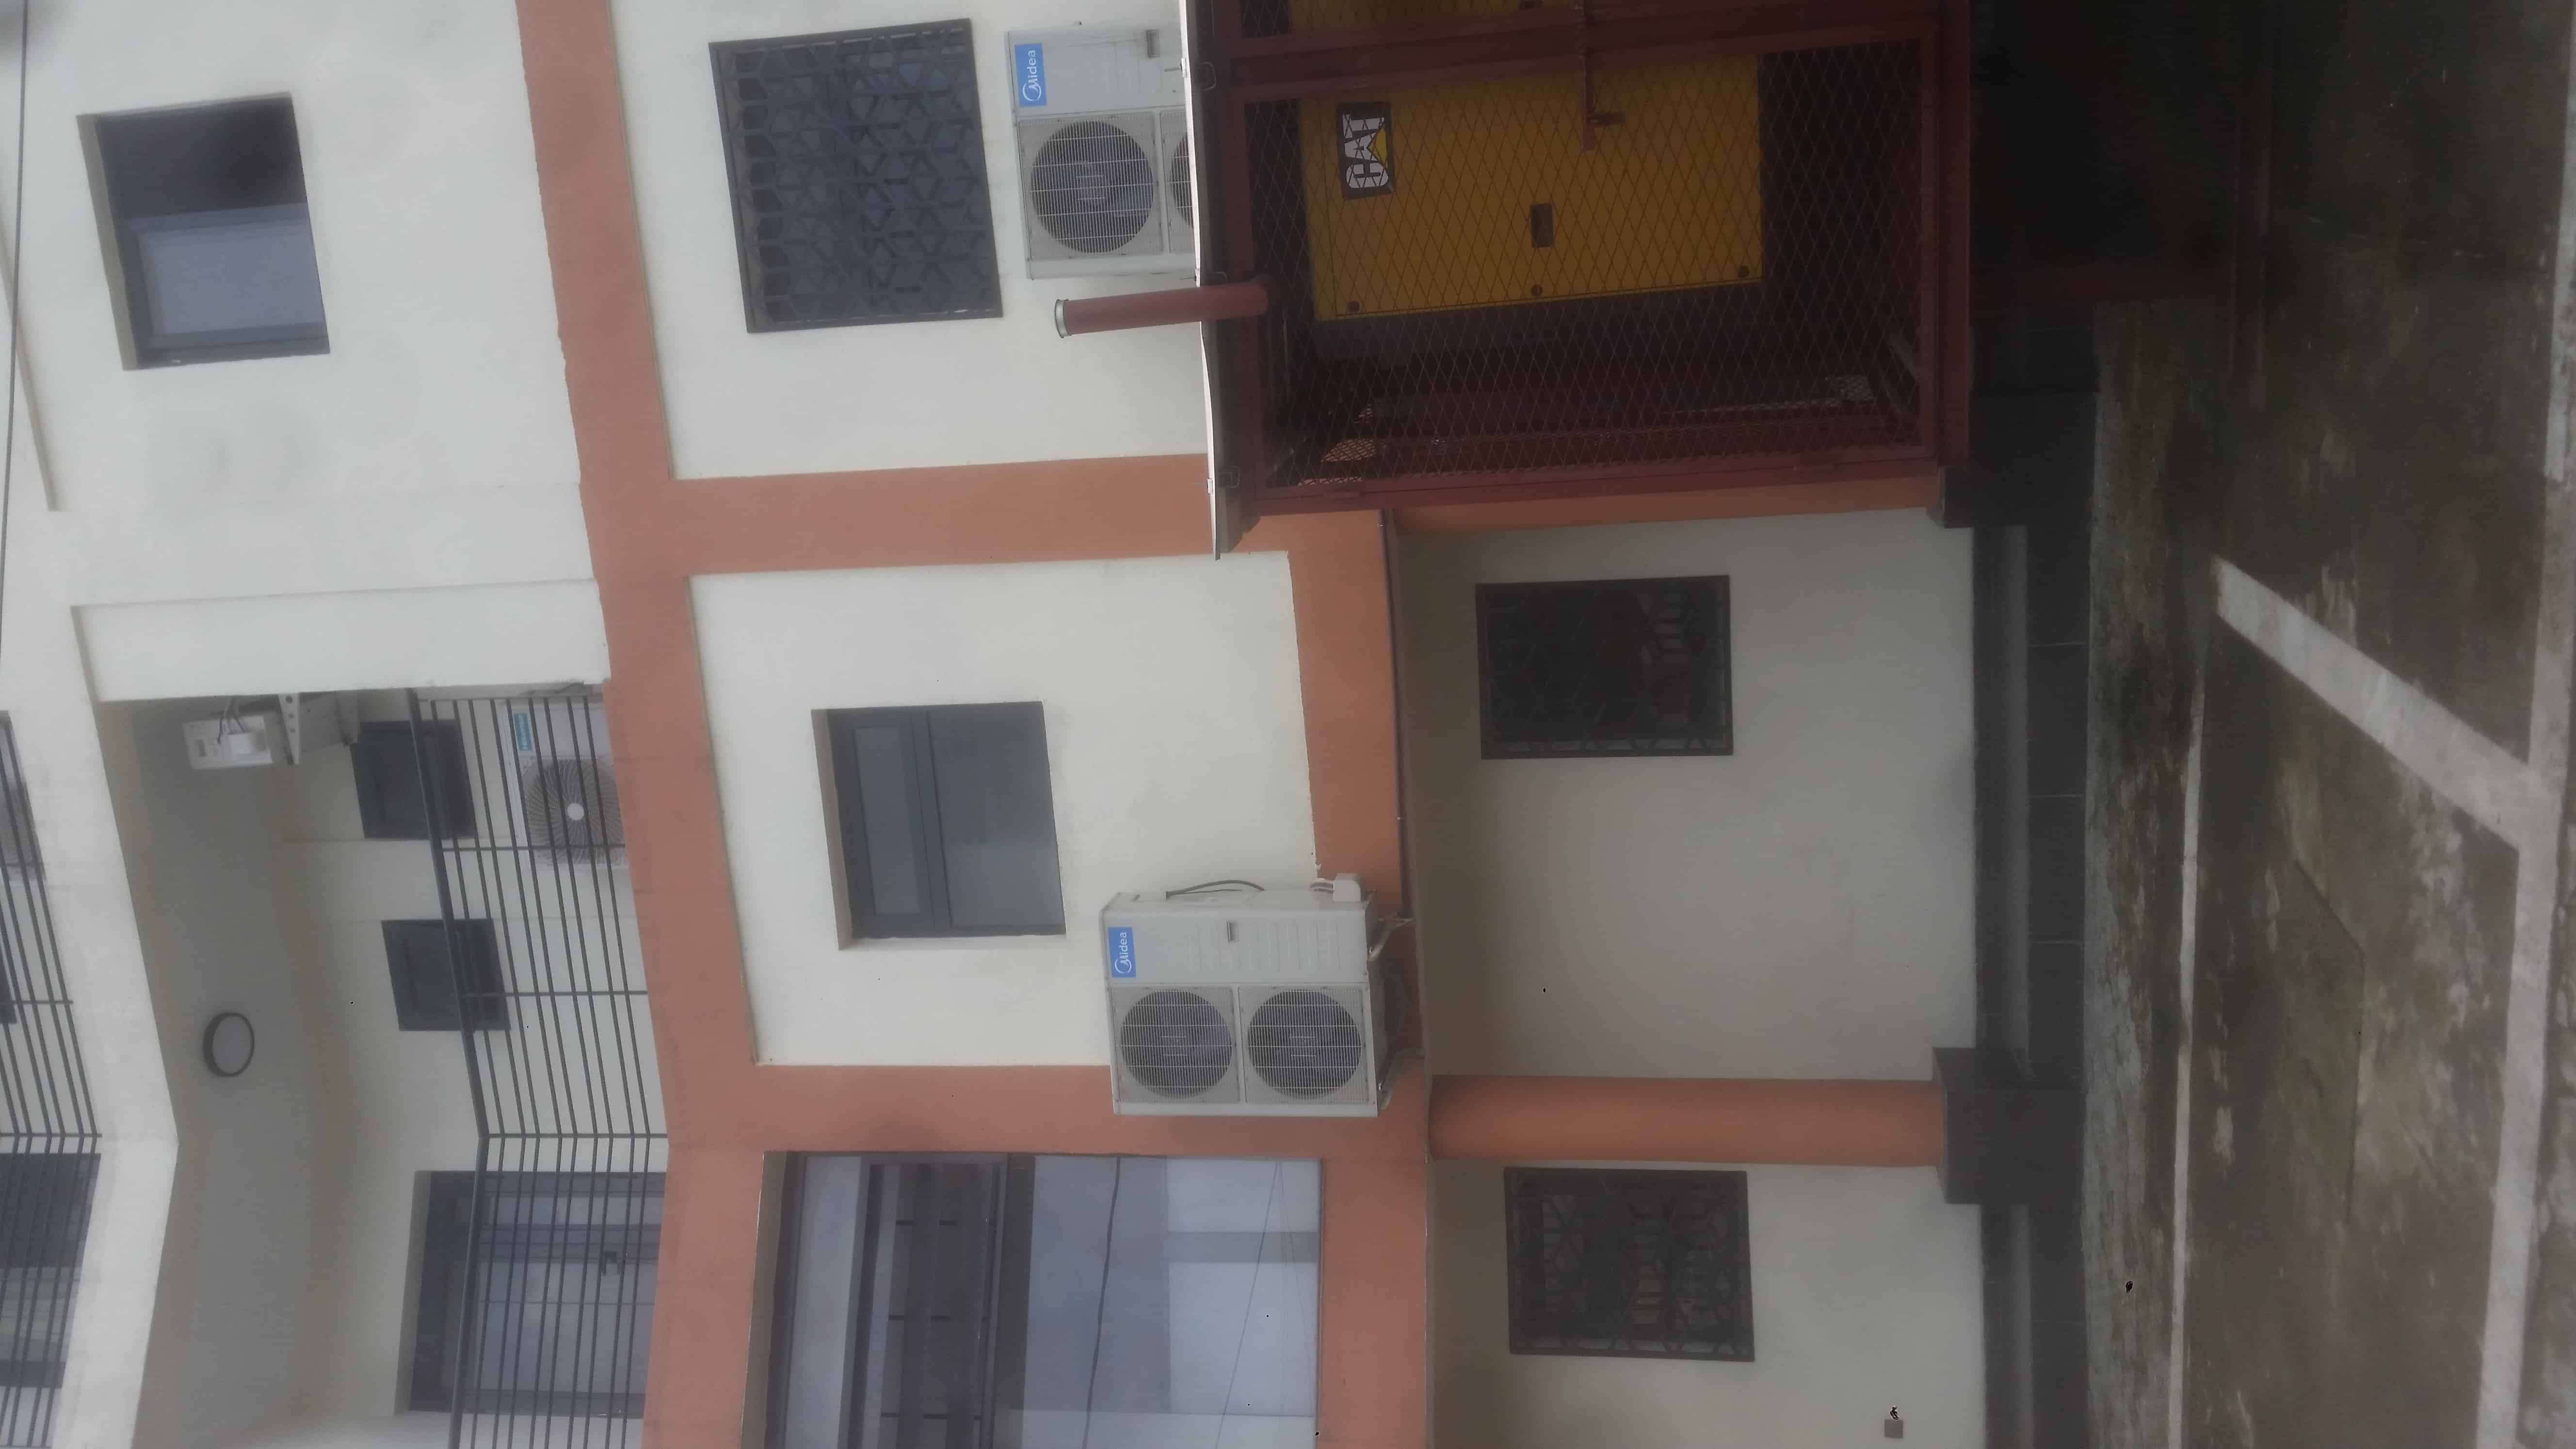 Apartment to rent - Douala, Bali, brasserie - 1 living room(s), 3 bedroom(s), 2 bathroom(s) - 400 000 FCFA / month